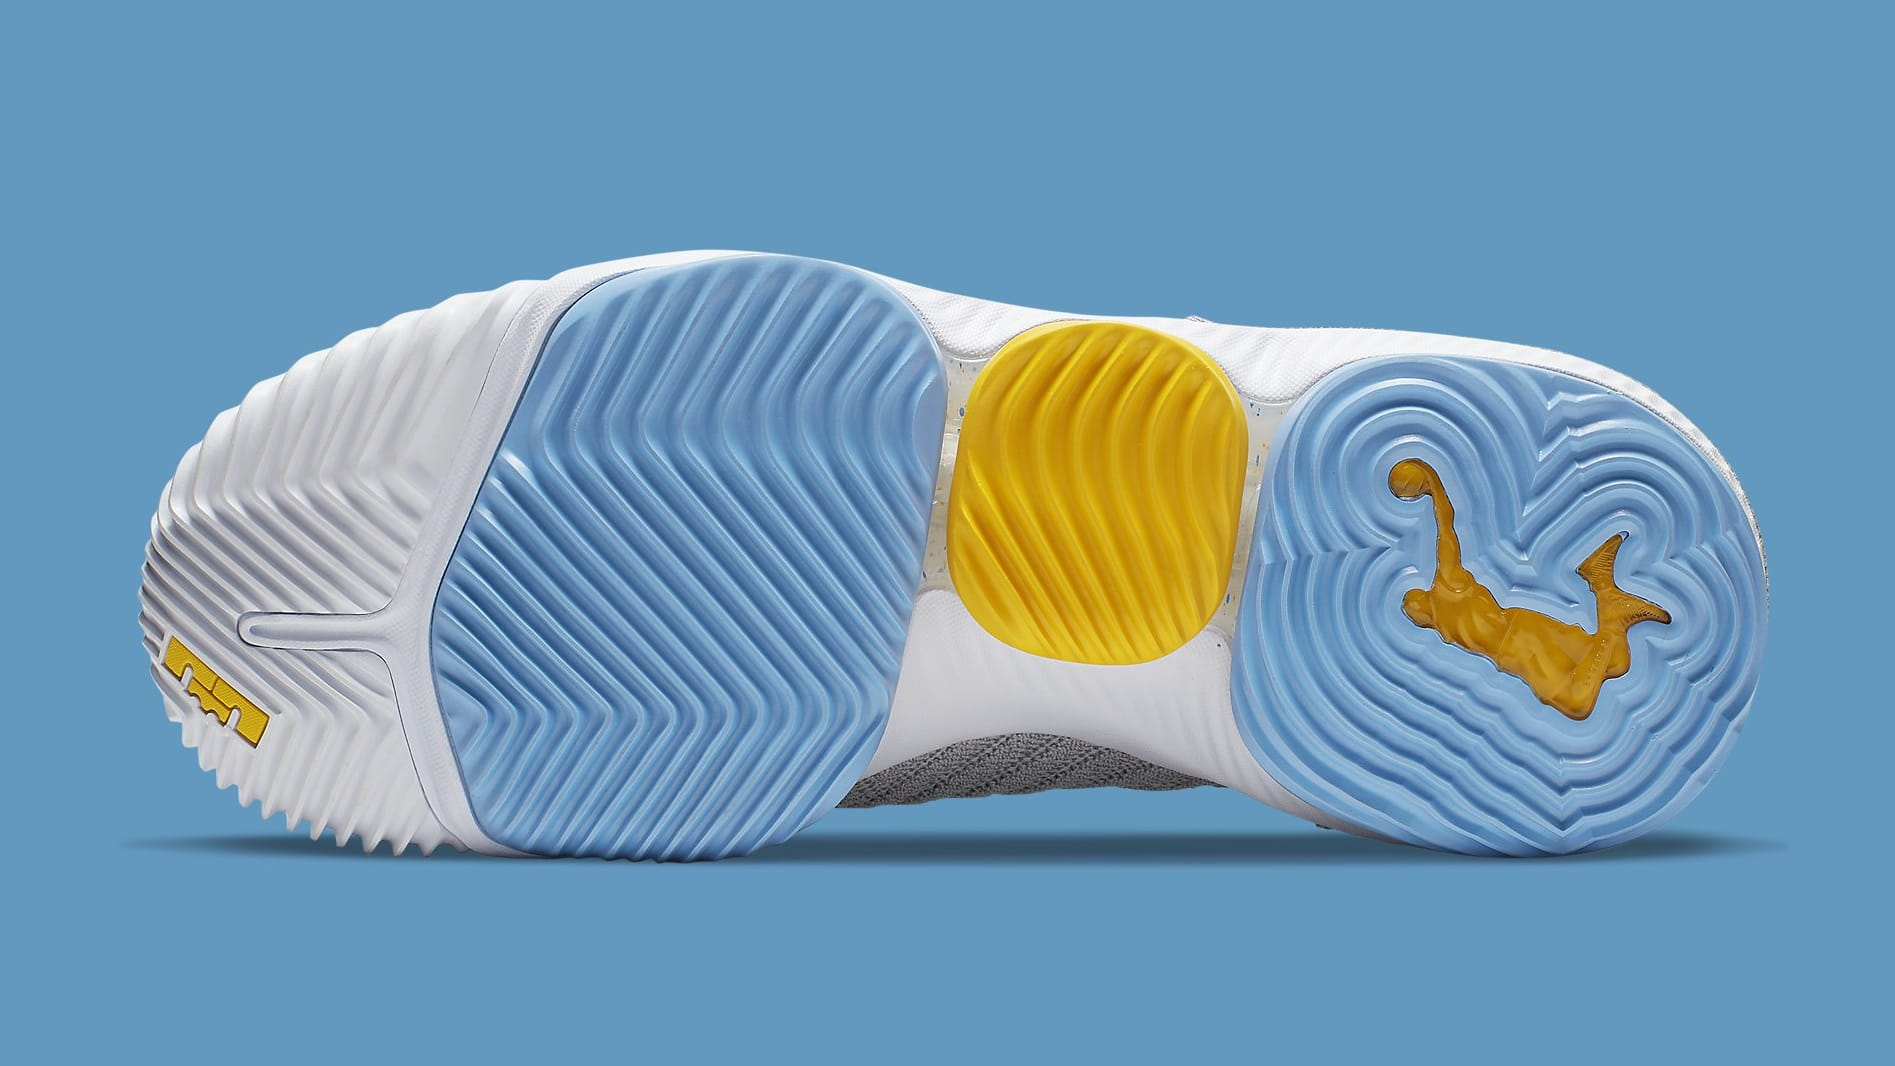 Nike LeBron 16 MPLS Release Date CK4765-001 Sole